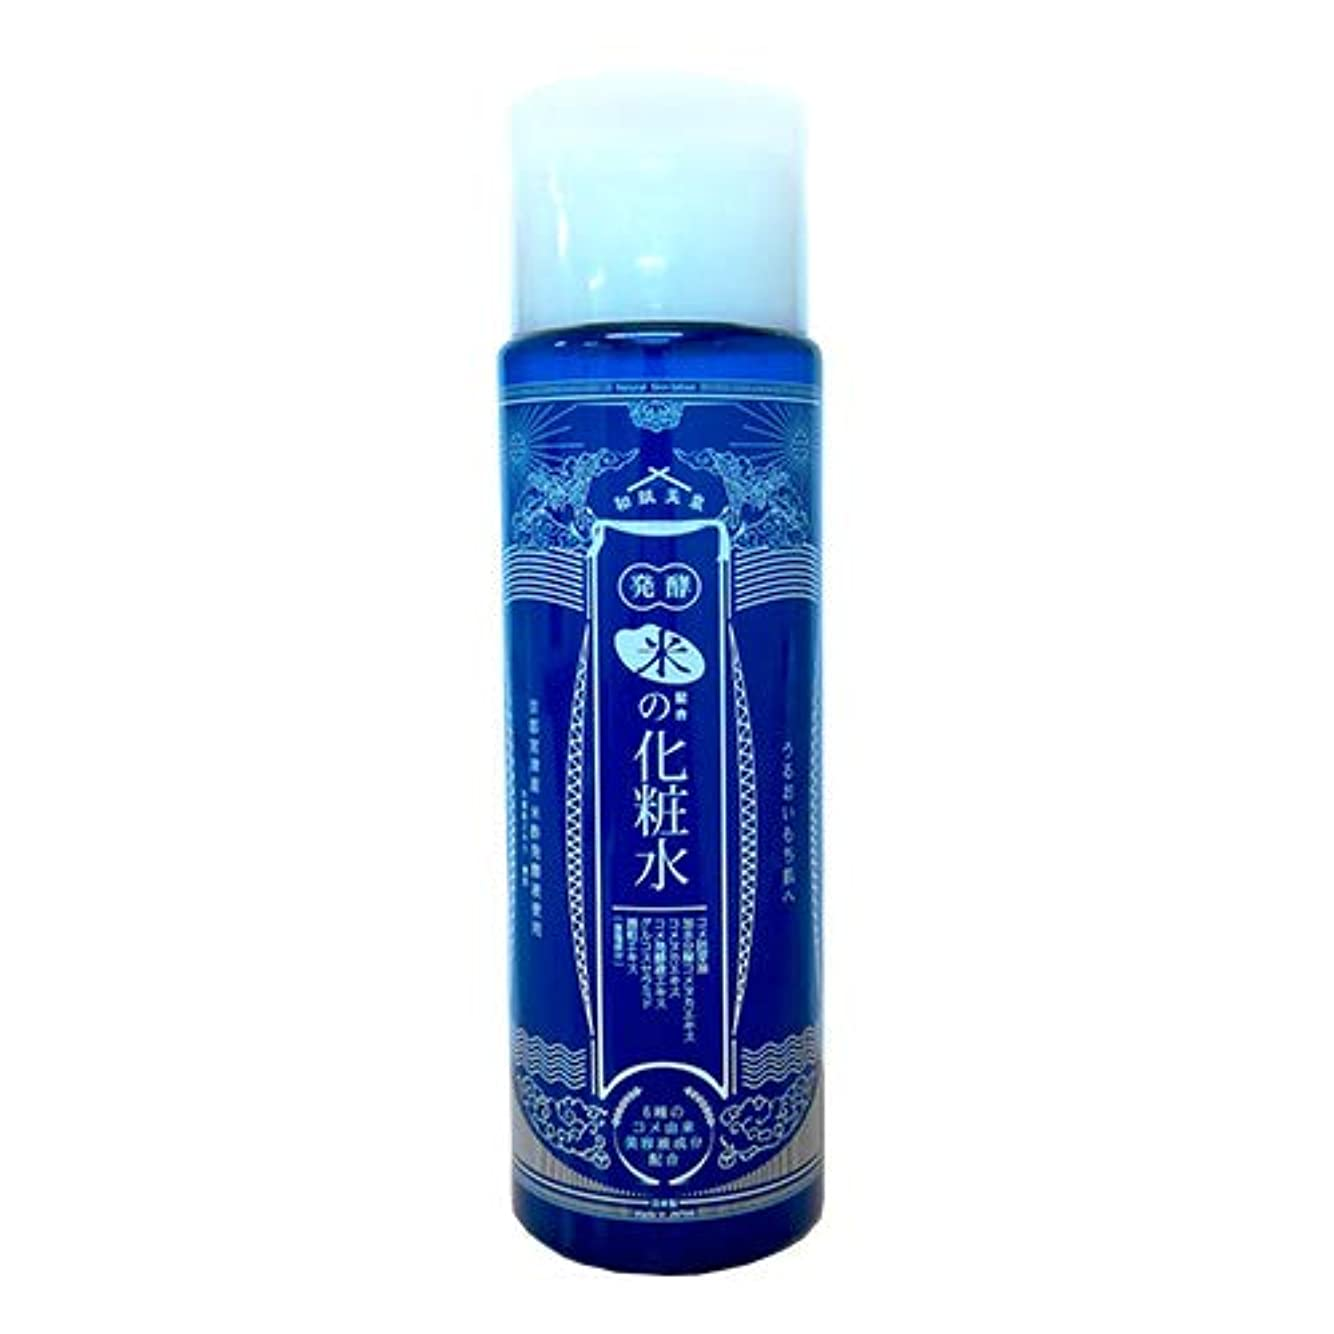 遠征ガス周術期和肌美泉 発酵•米配合の化粧水 180ml